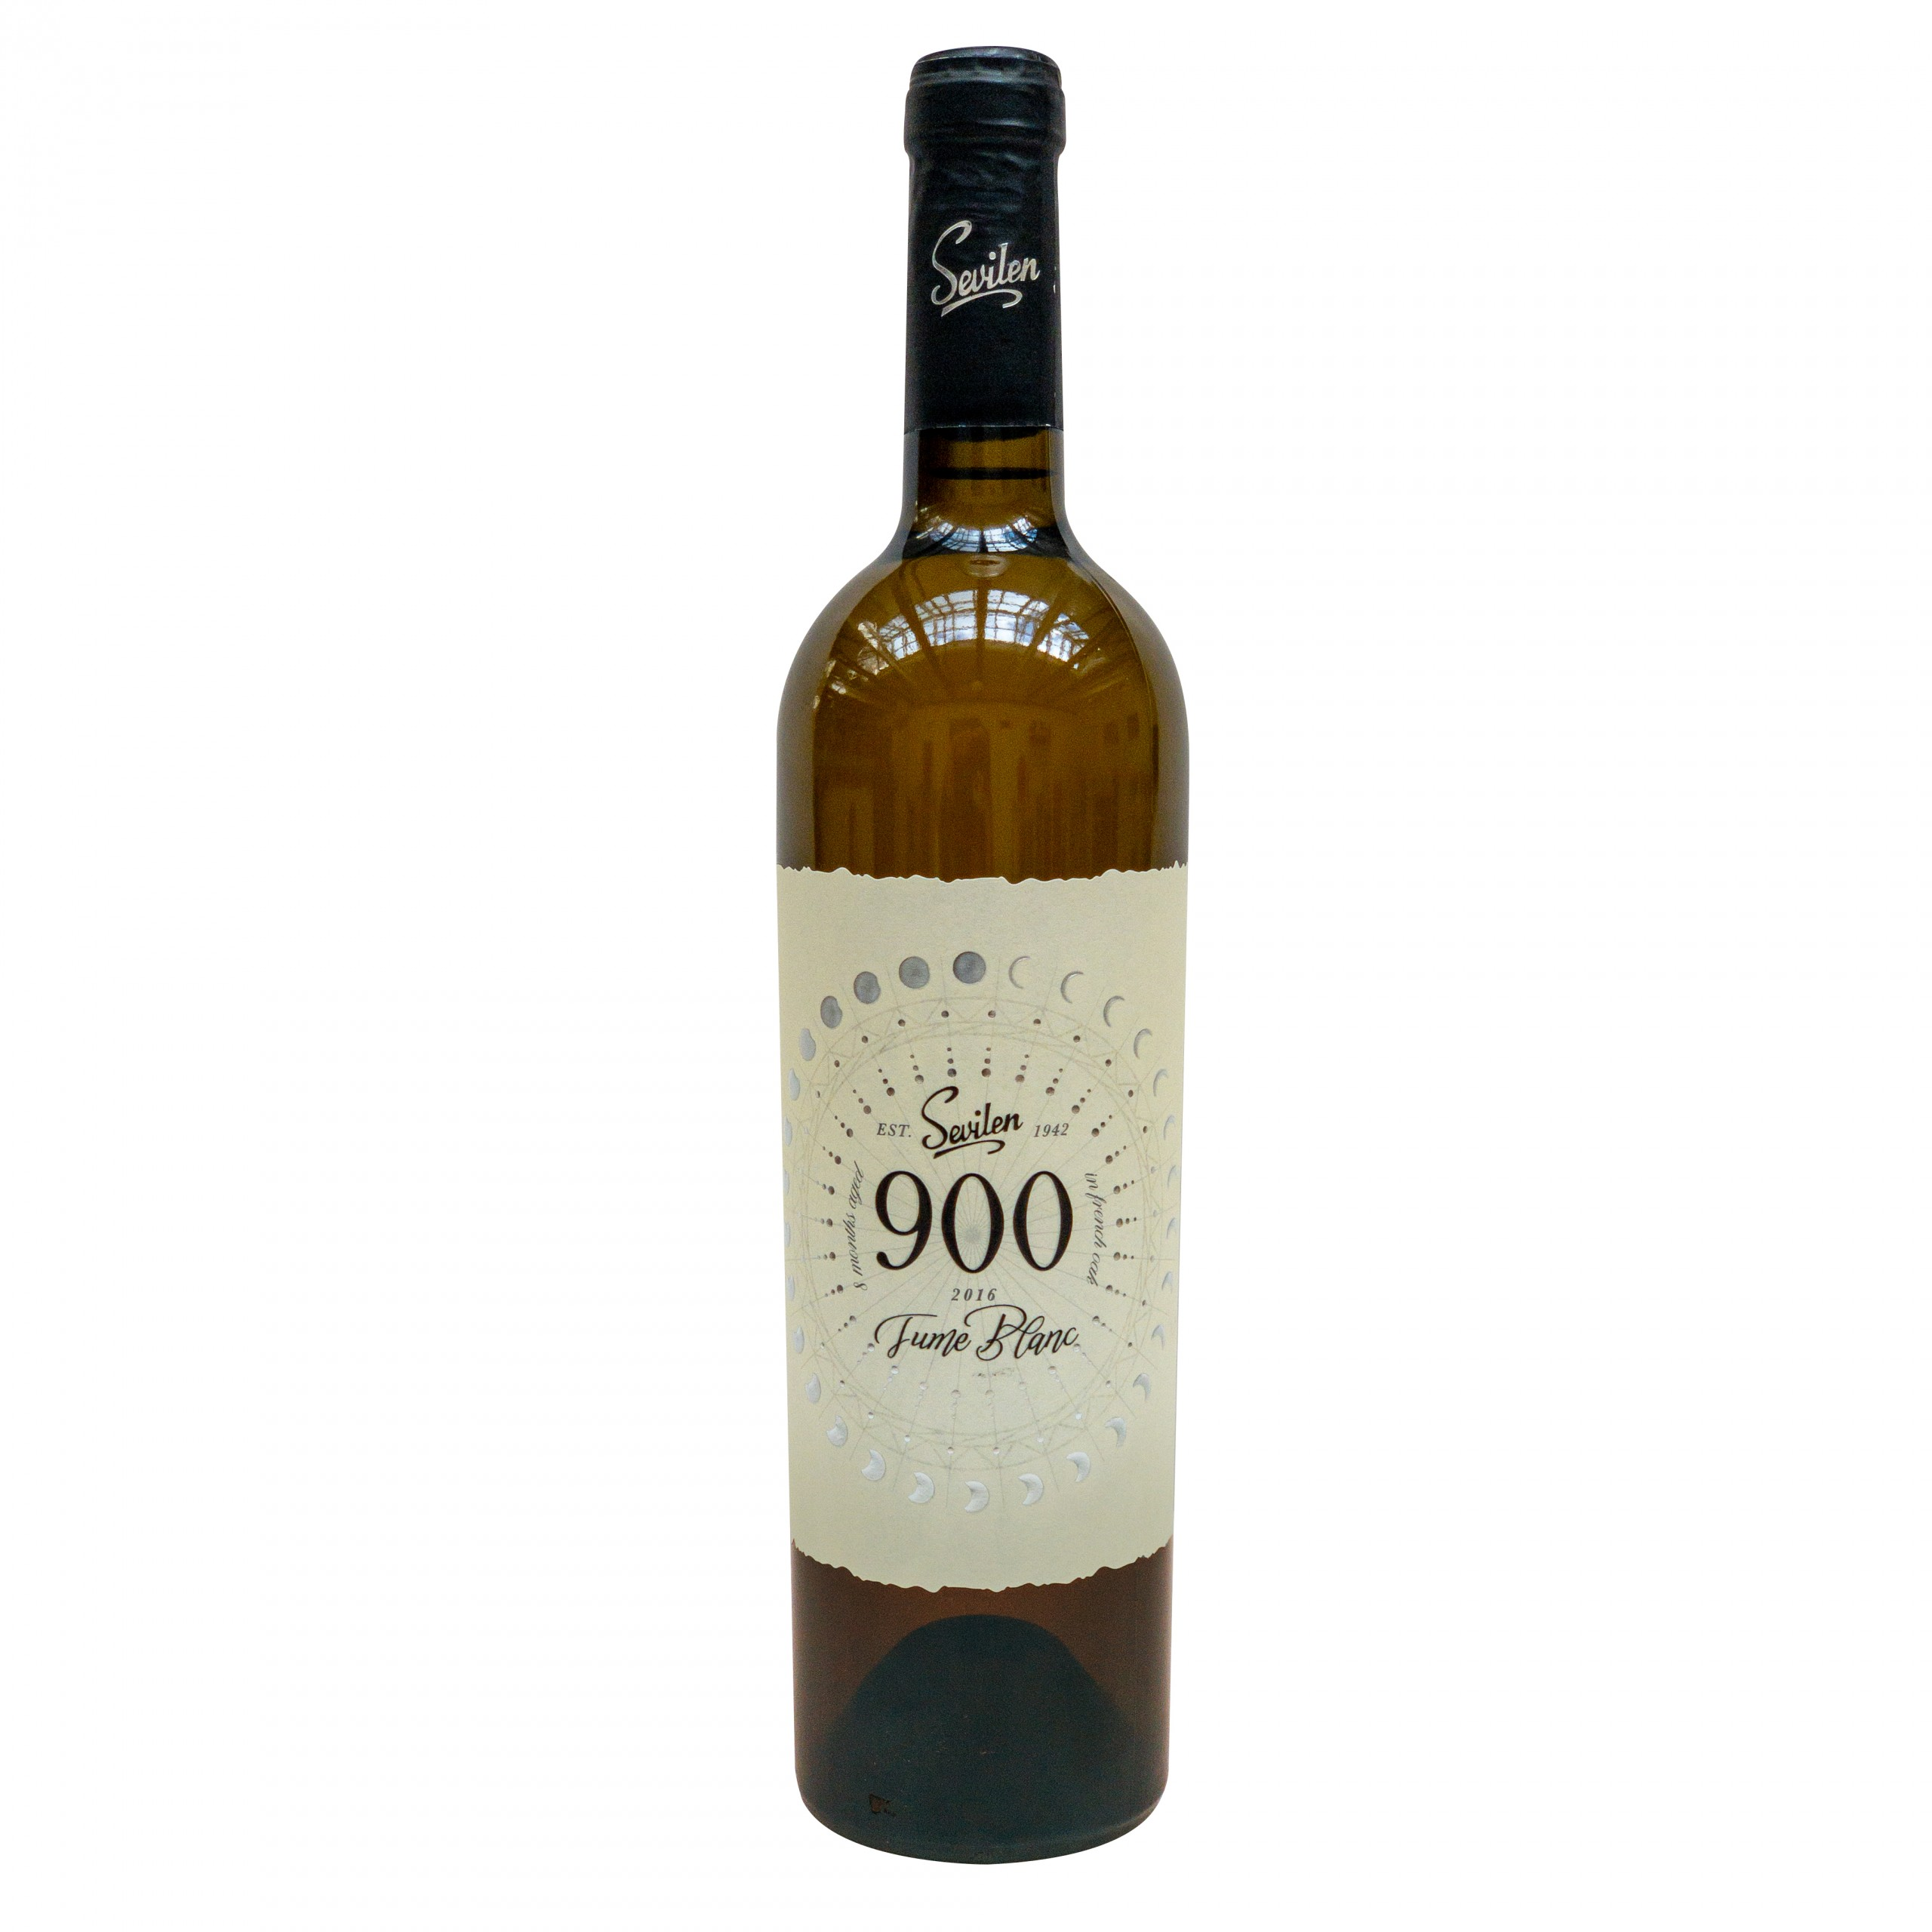 Sevilen - 900 Fume Blanc